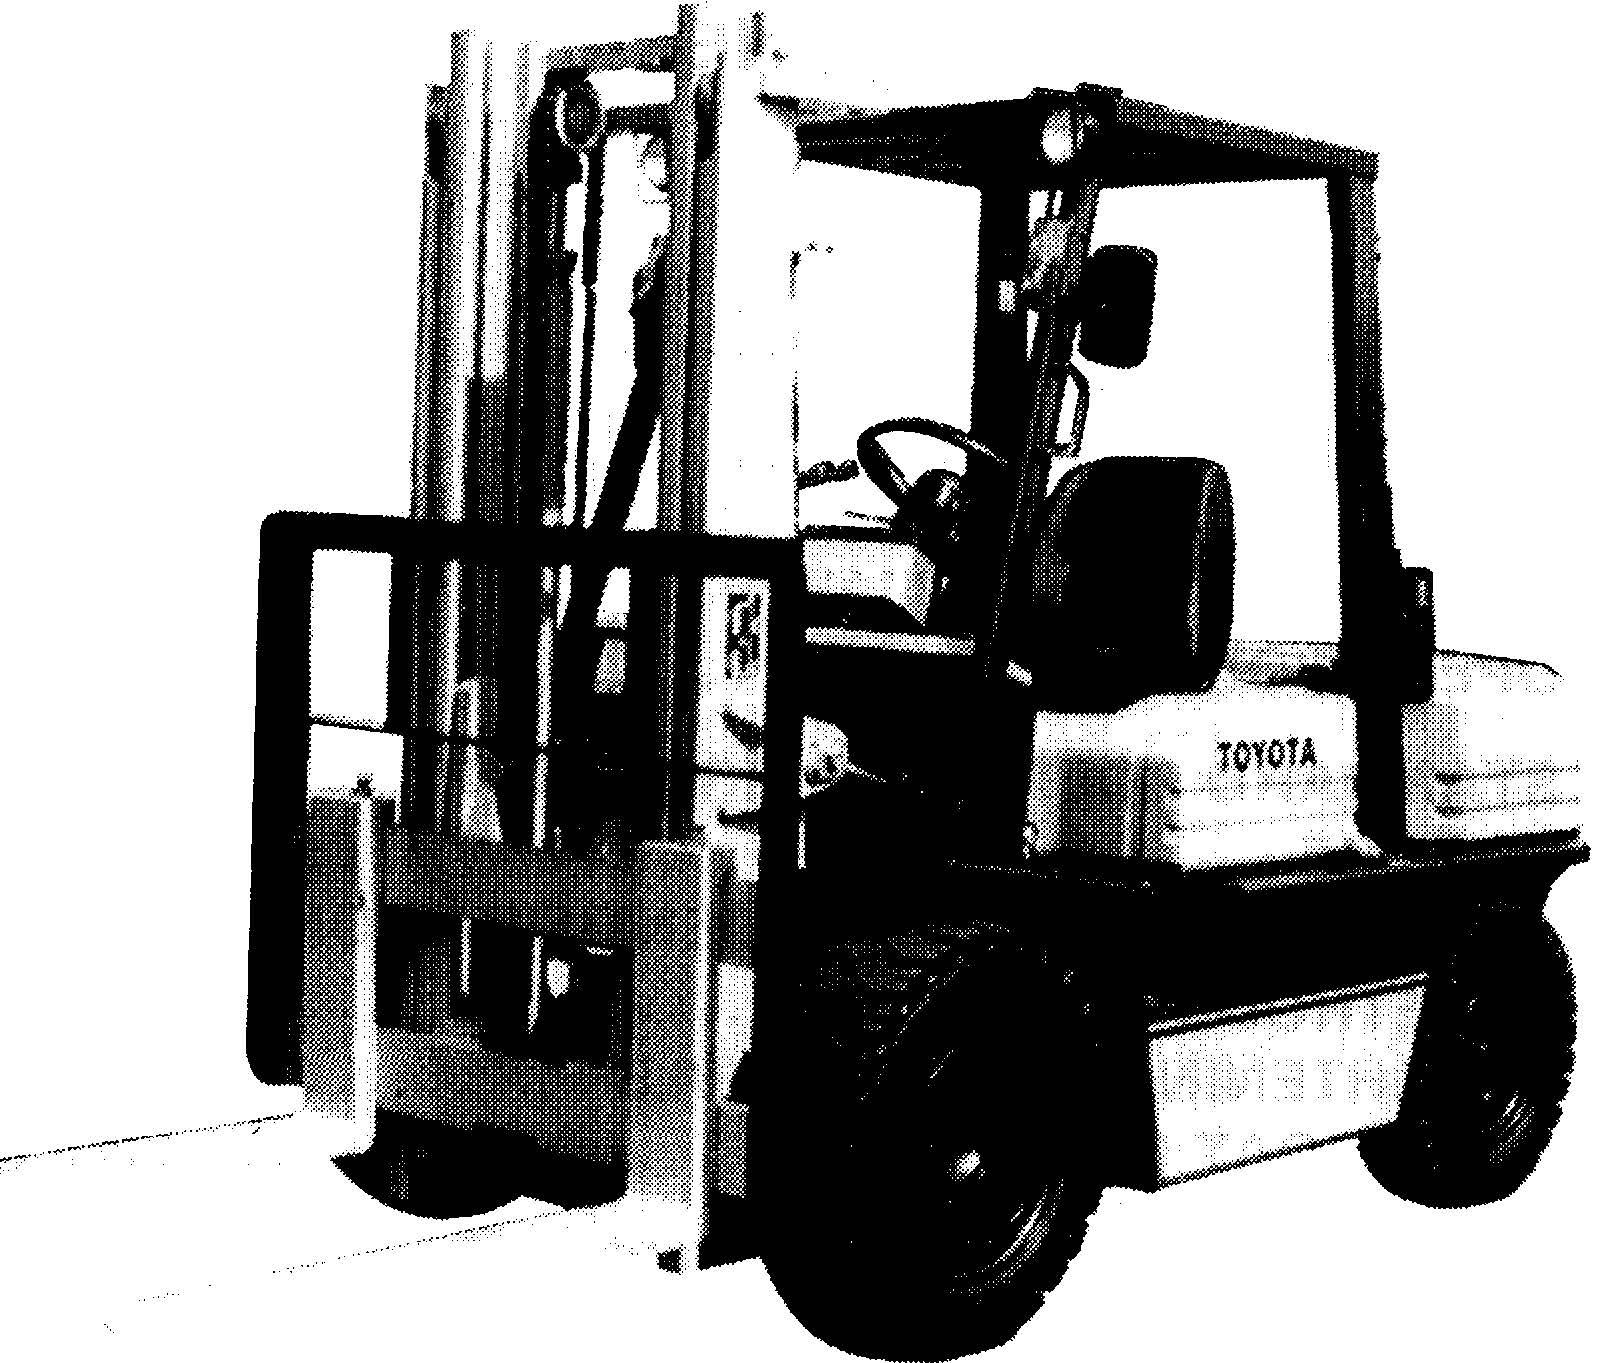 repair manual mitsubishi forklift trucks 2 Array - toyota forklift 5fgc  5fdc18 30 series service repair m rh sellfy com